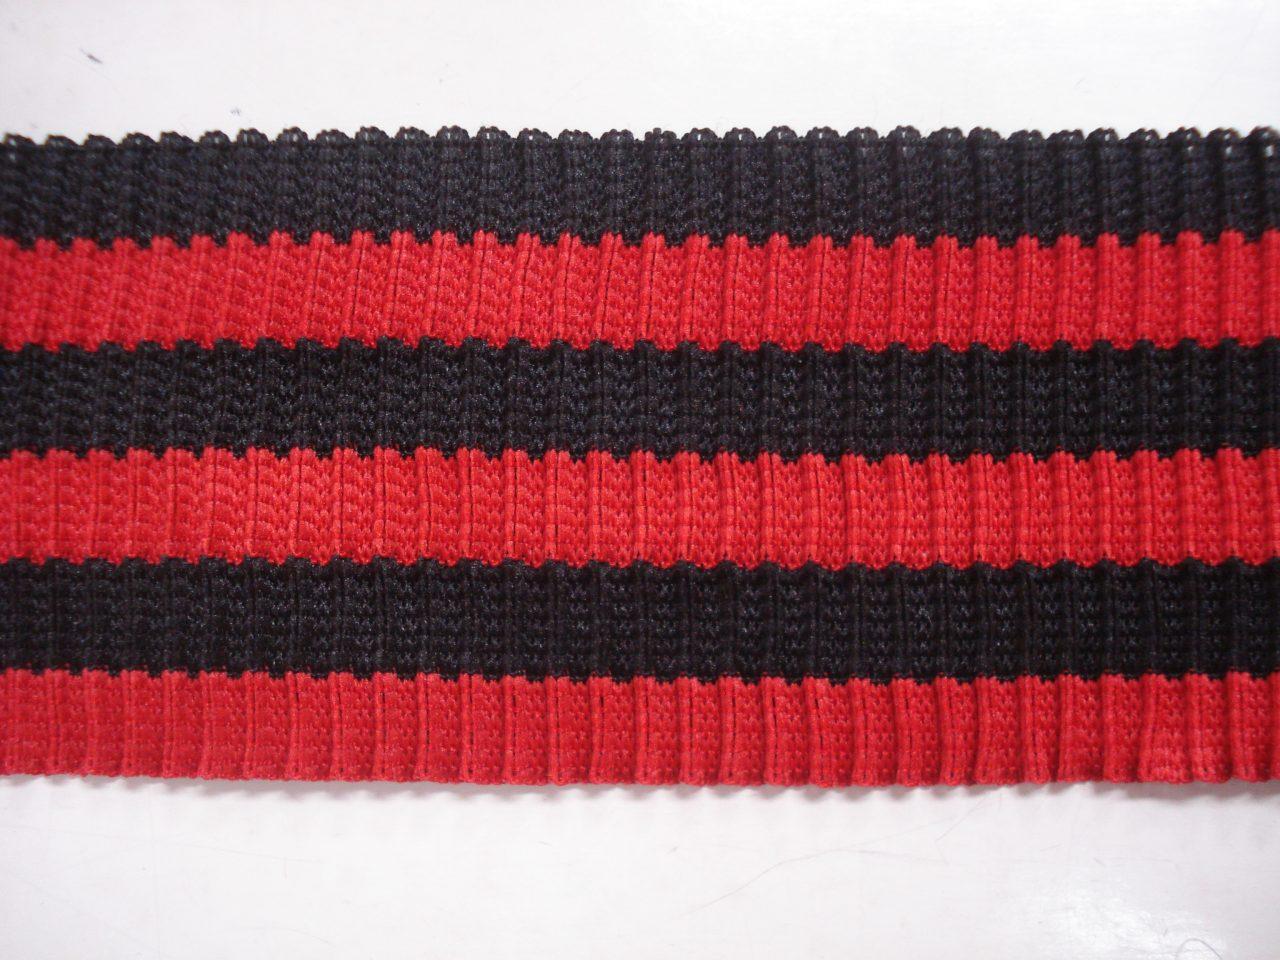 fbee64d4791 Gestreepte boord grove rib rood/zwart 6cm breed